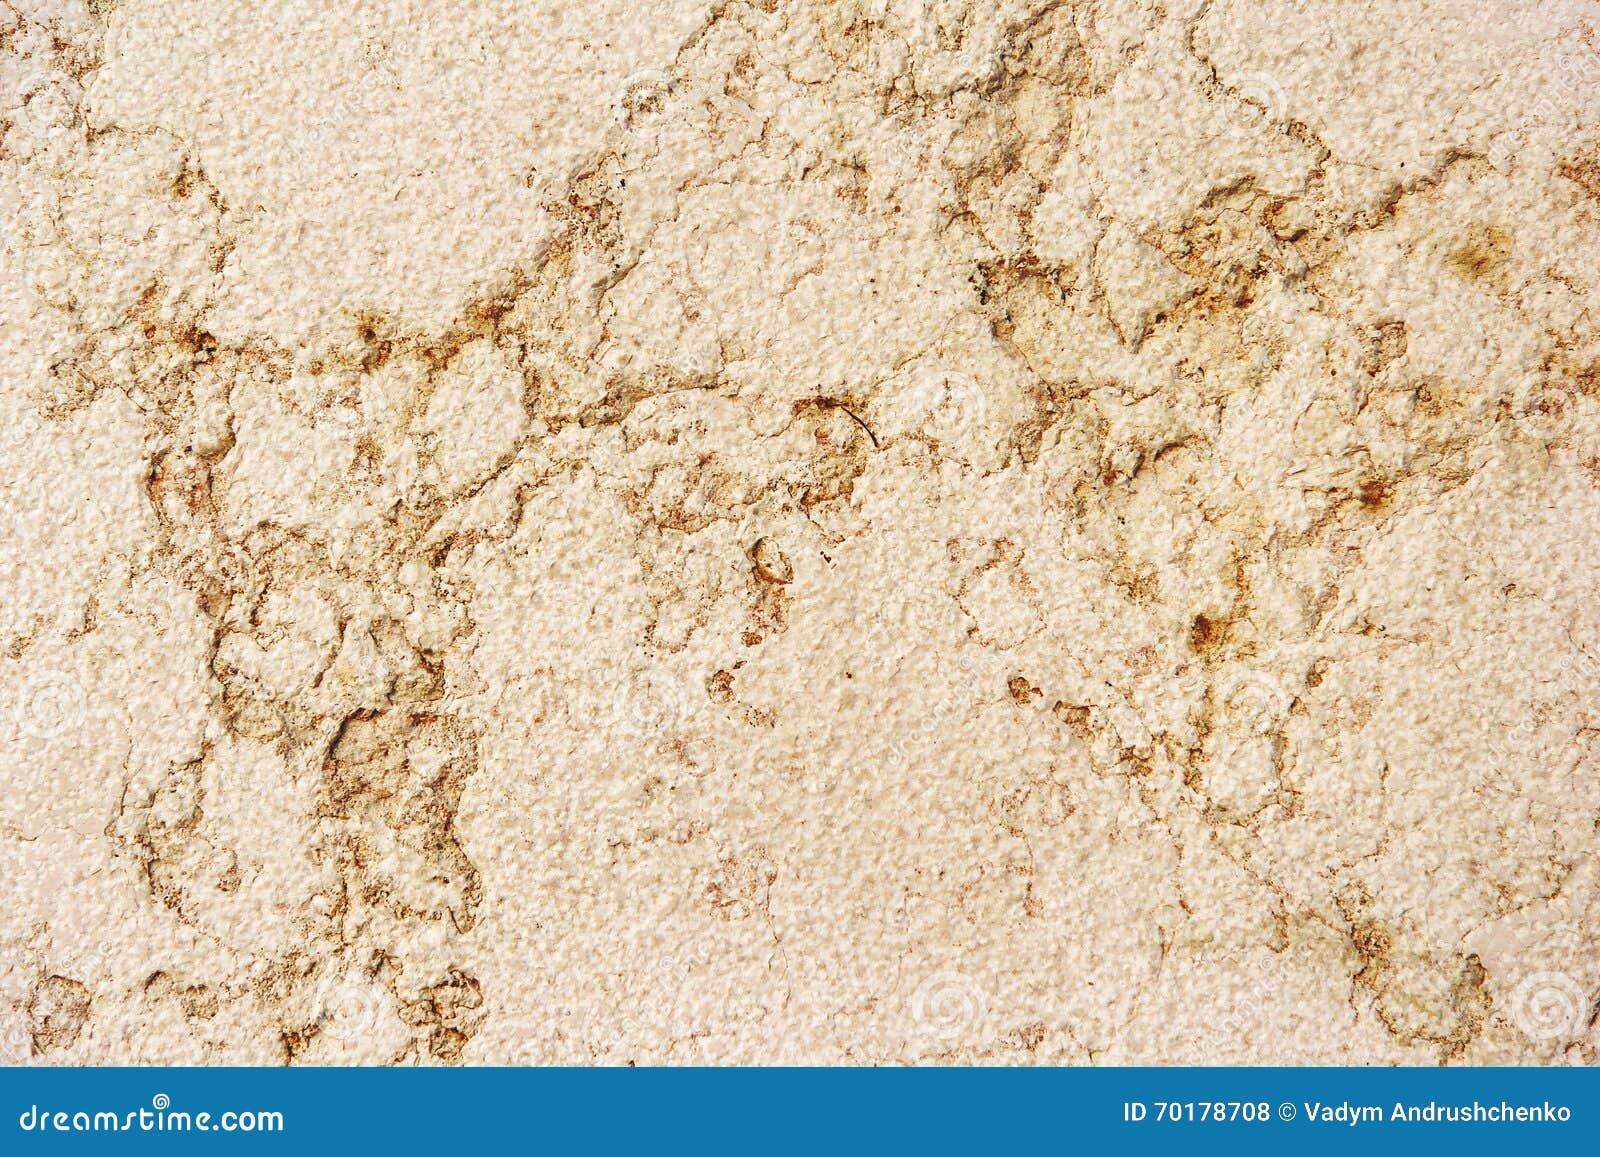 Fondo de la textura de la piedra arenisca